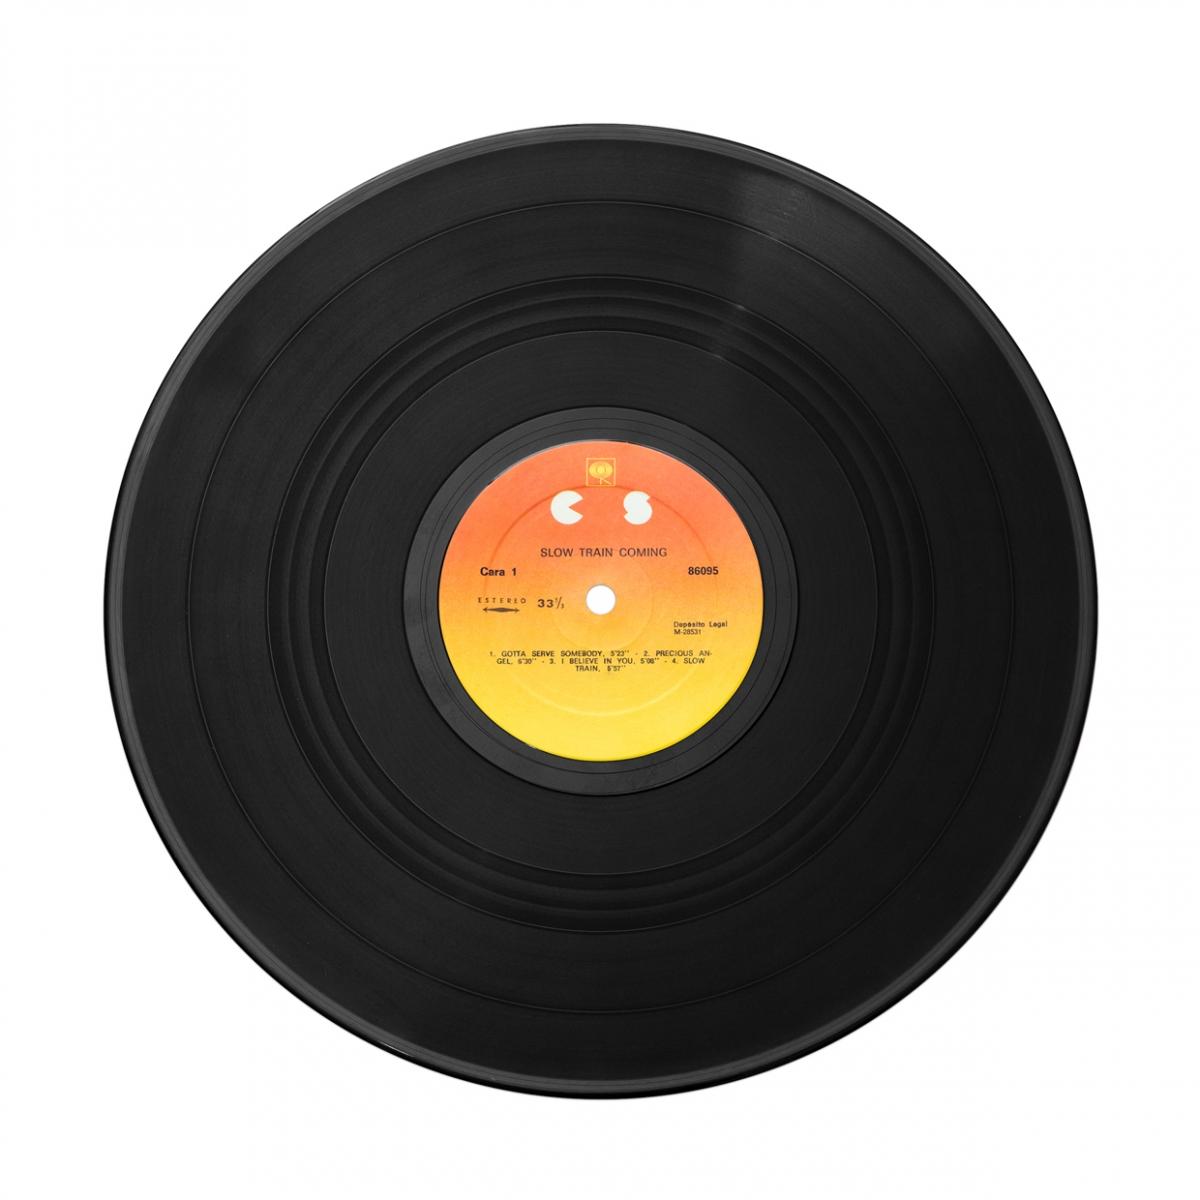 Imagen en la que se ve un disco de vinilo